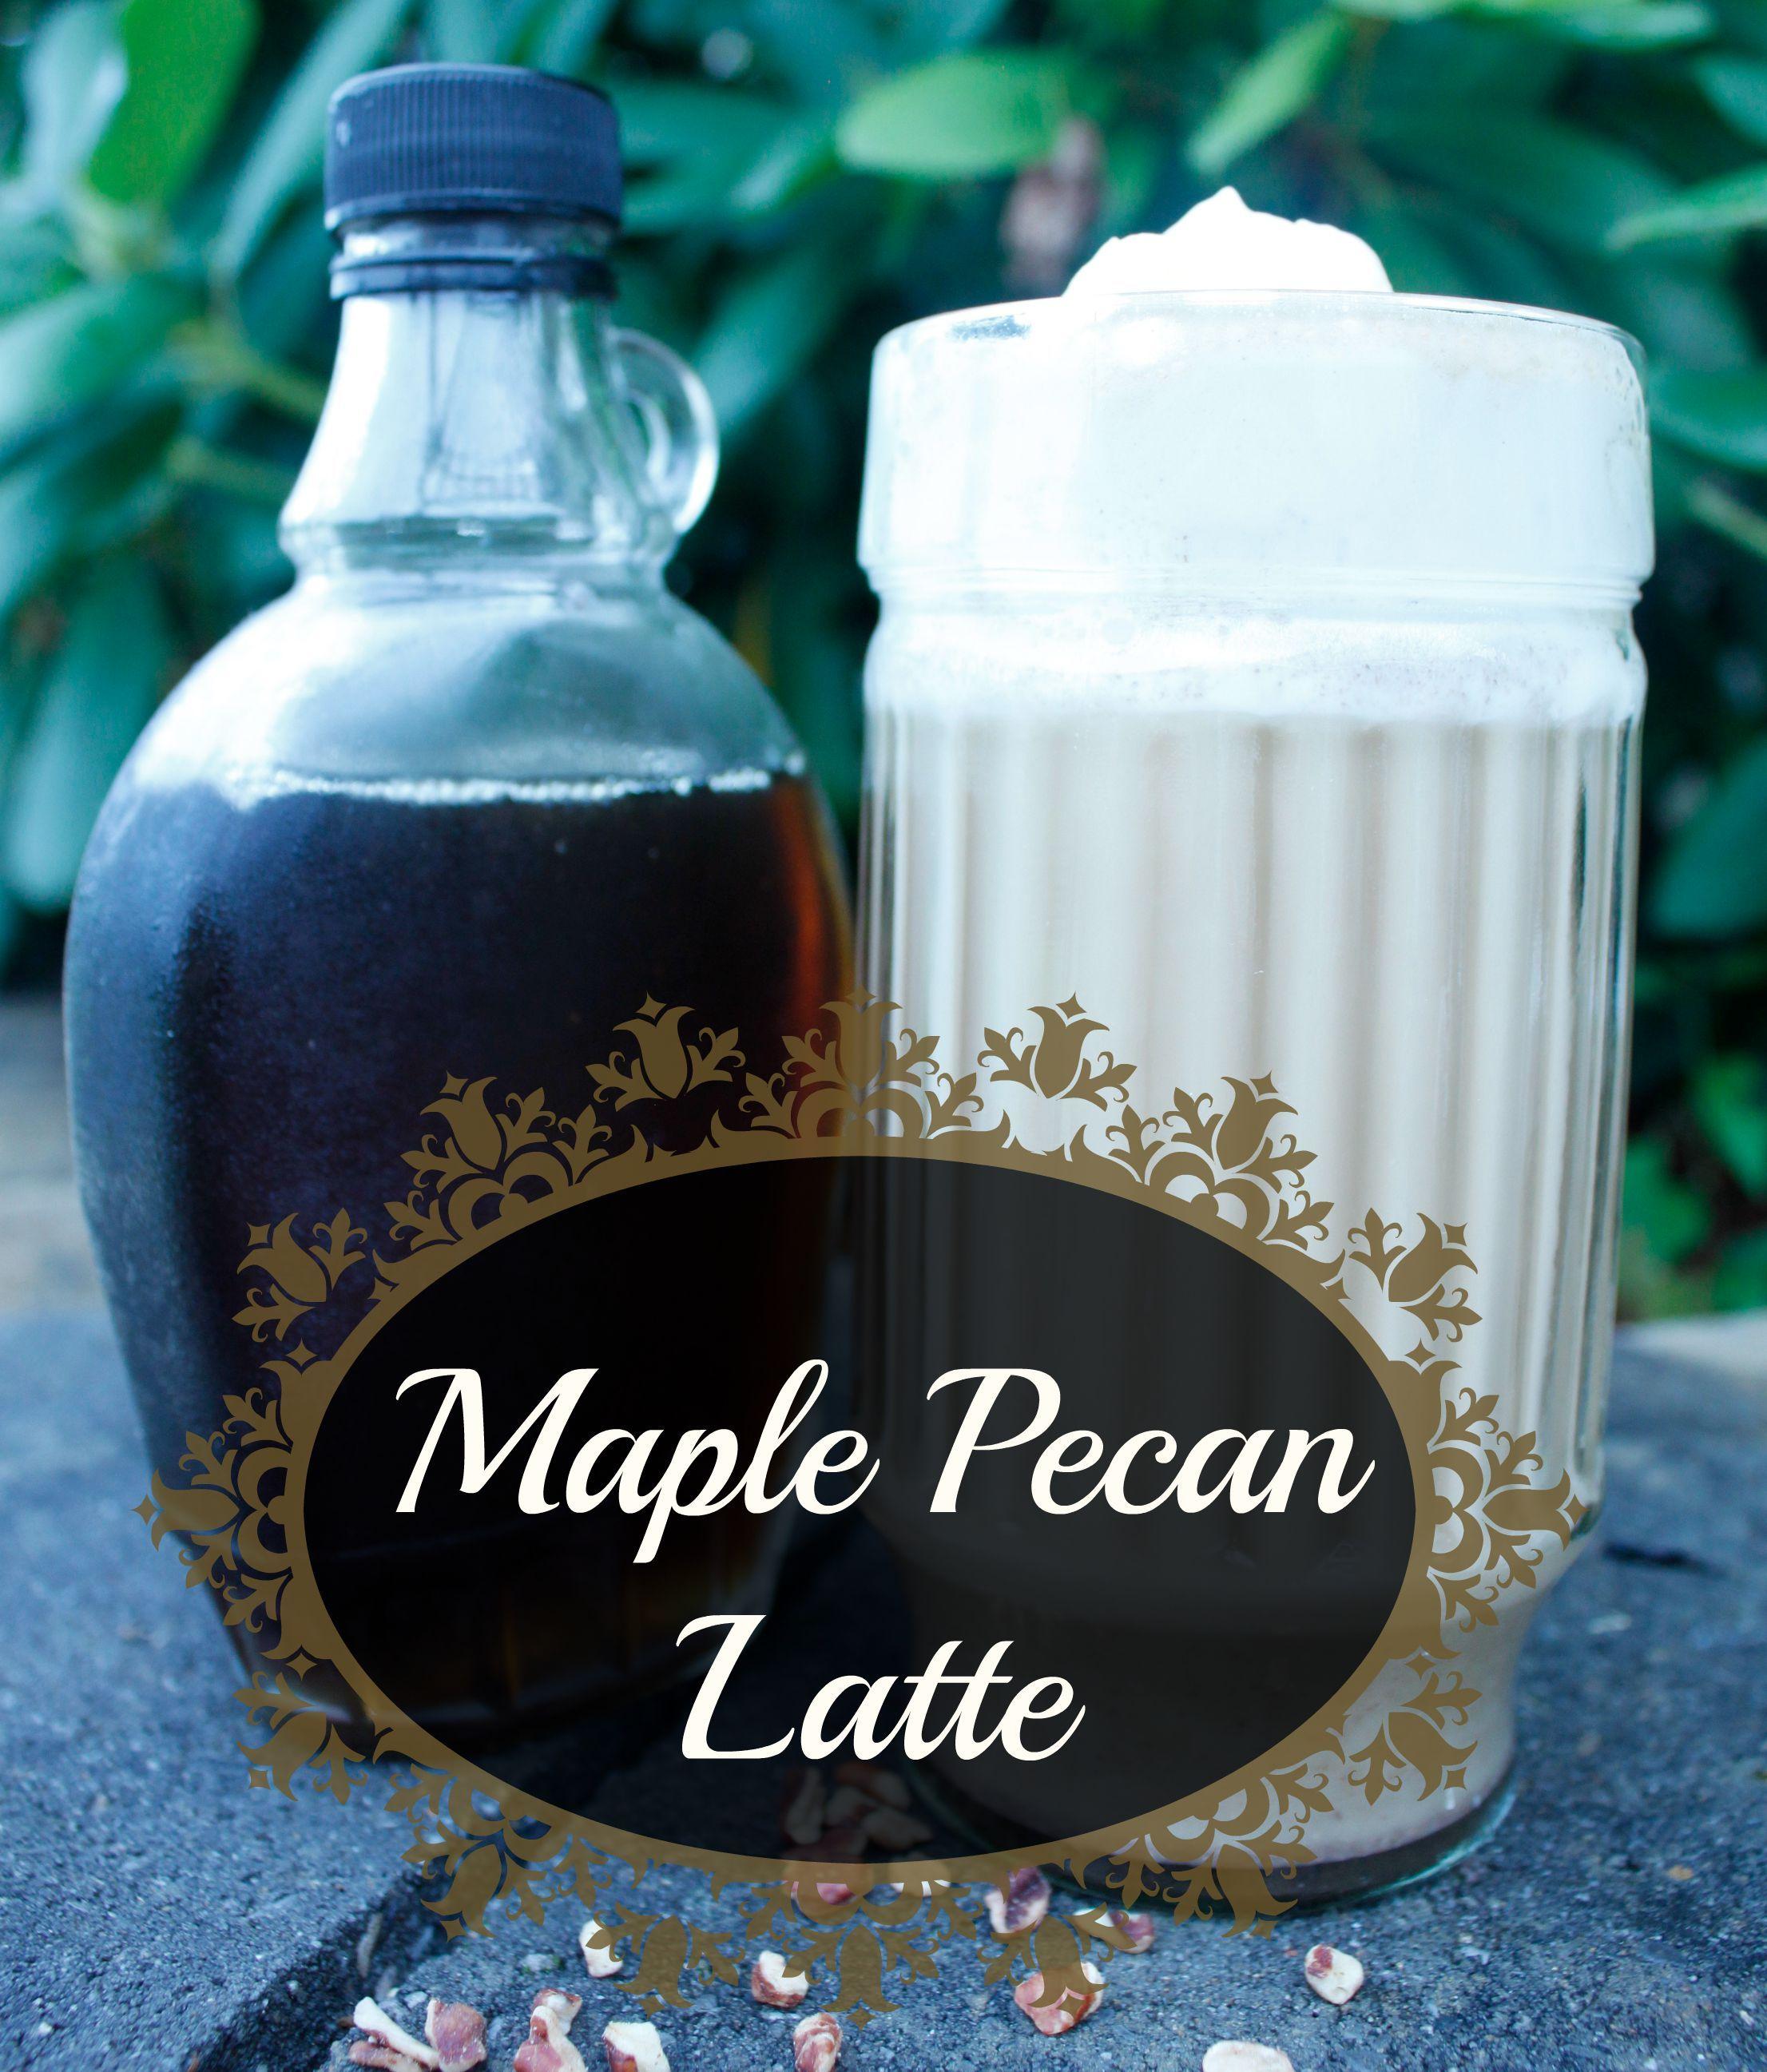 Maple Pecan Latte #diycoffeeshop #natural #norefinedsugar